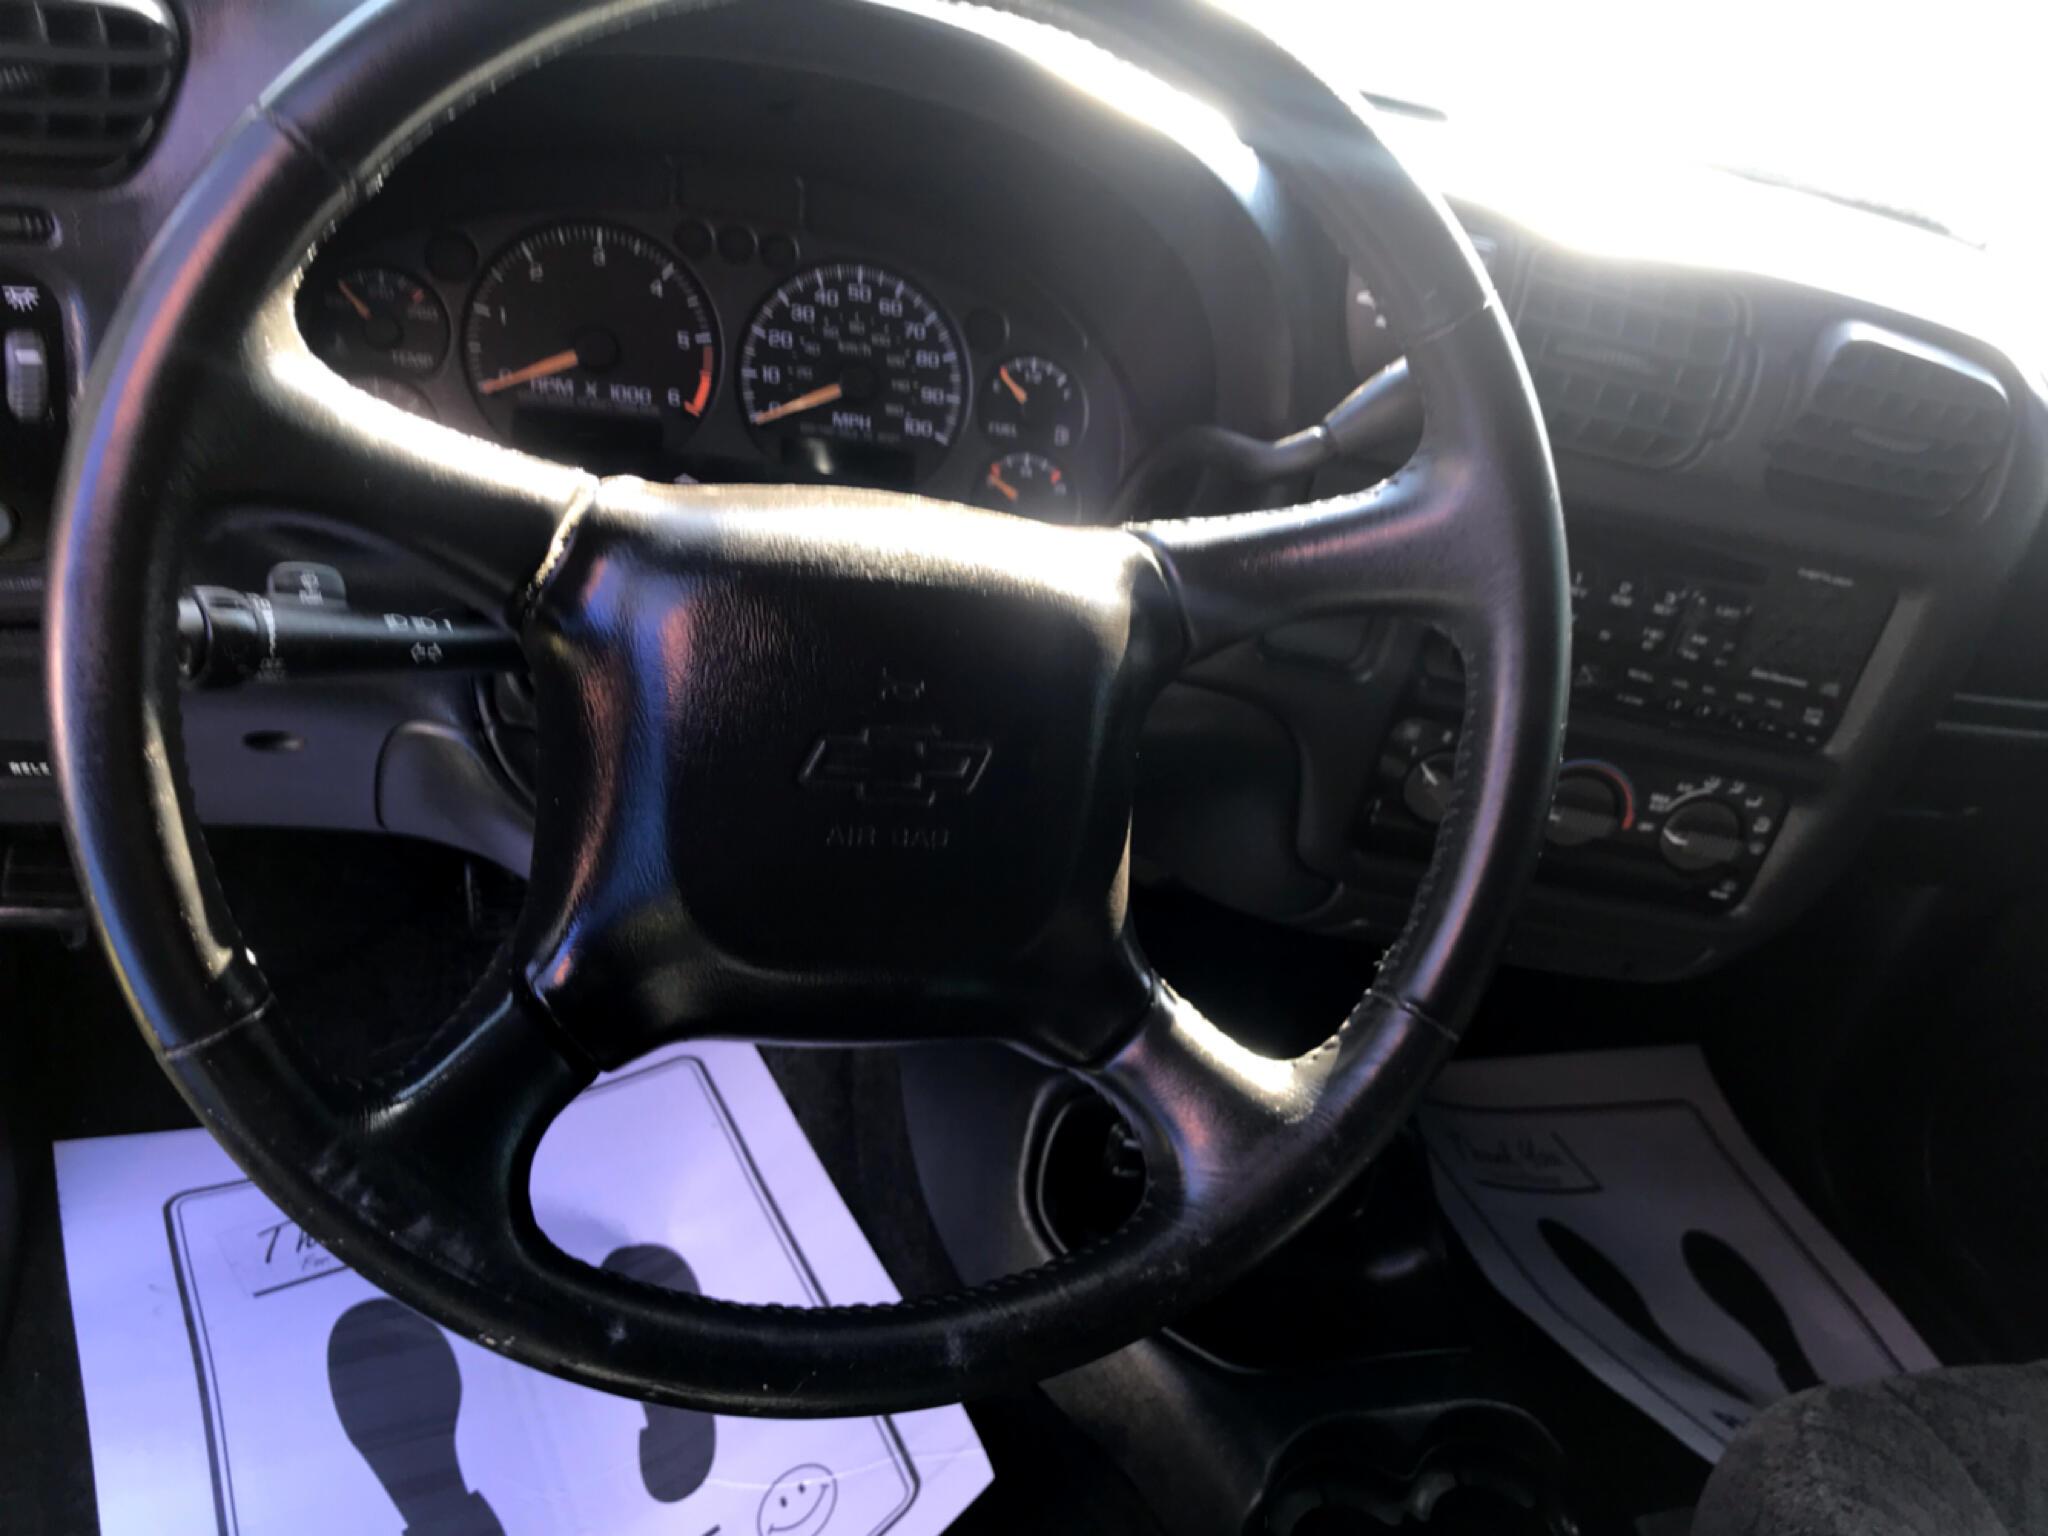 2002 Chevrolet S-10 Crew Cab 123